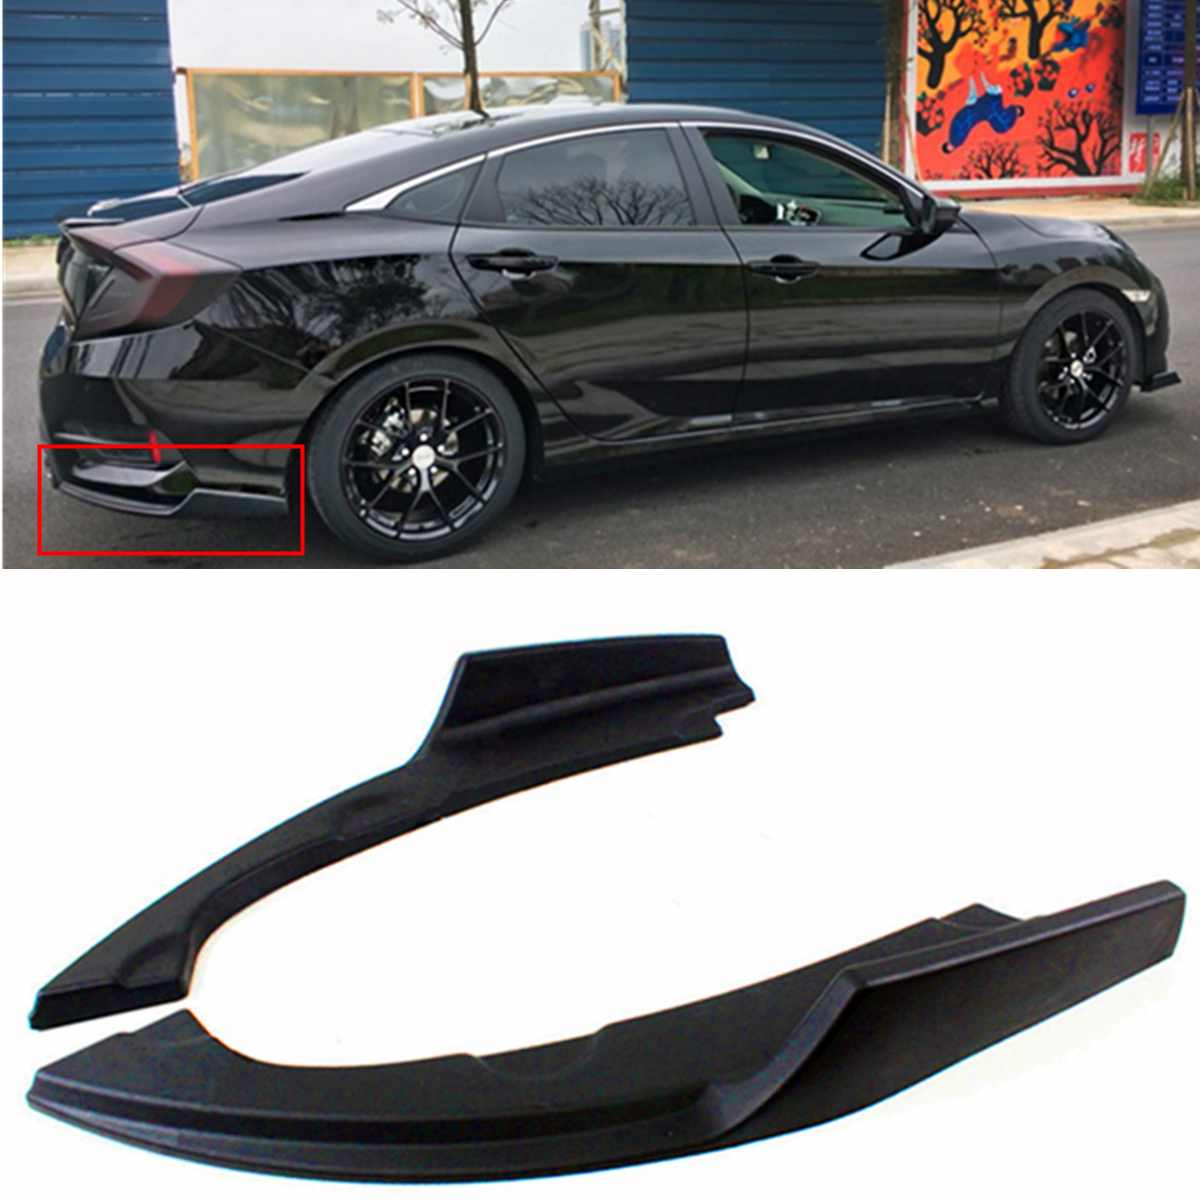 2 uds parachoques trasero Splitters parte inferior labio delantal esquina cenefa cubiertas para Honda para Civic 2016-2018 4 puertas sedán modelo negro